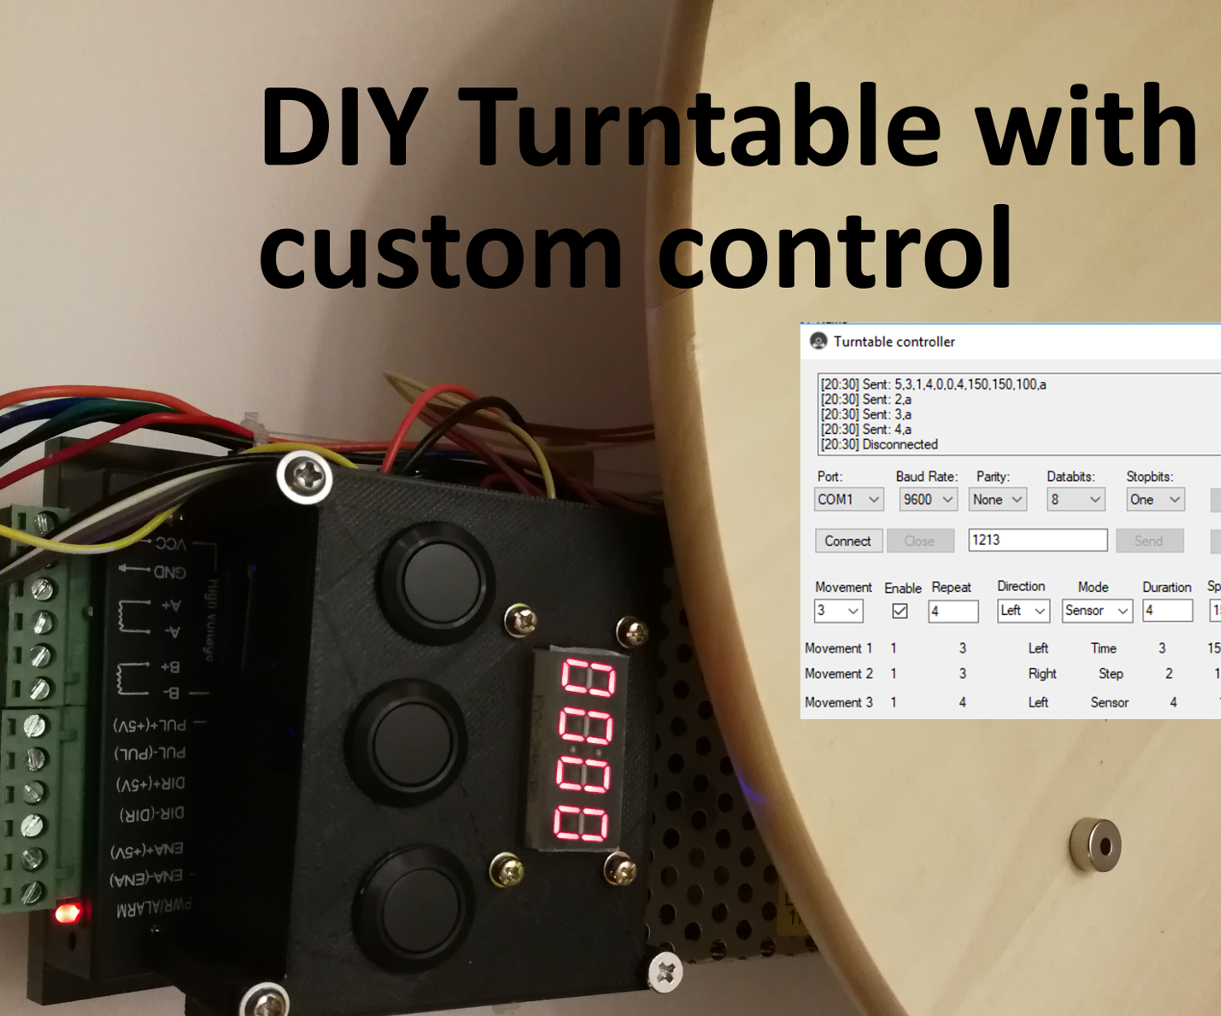 DIY Turntable With Custom Control: 5 Steps